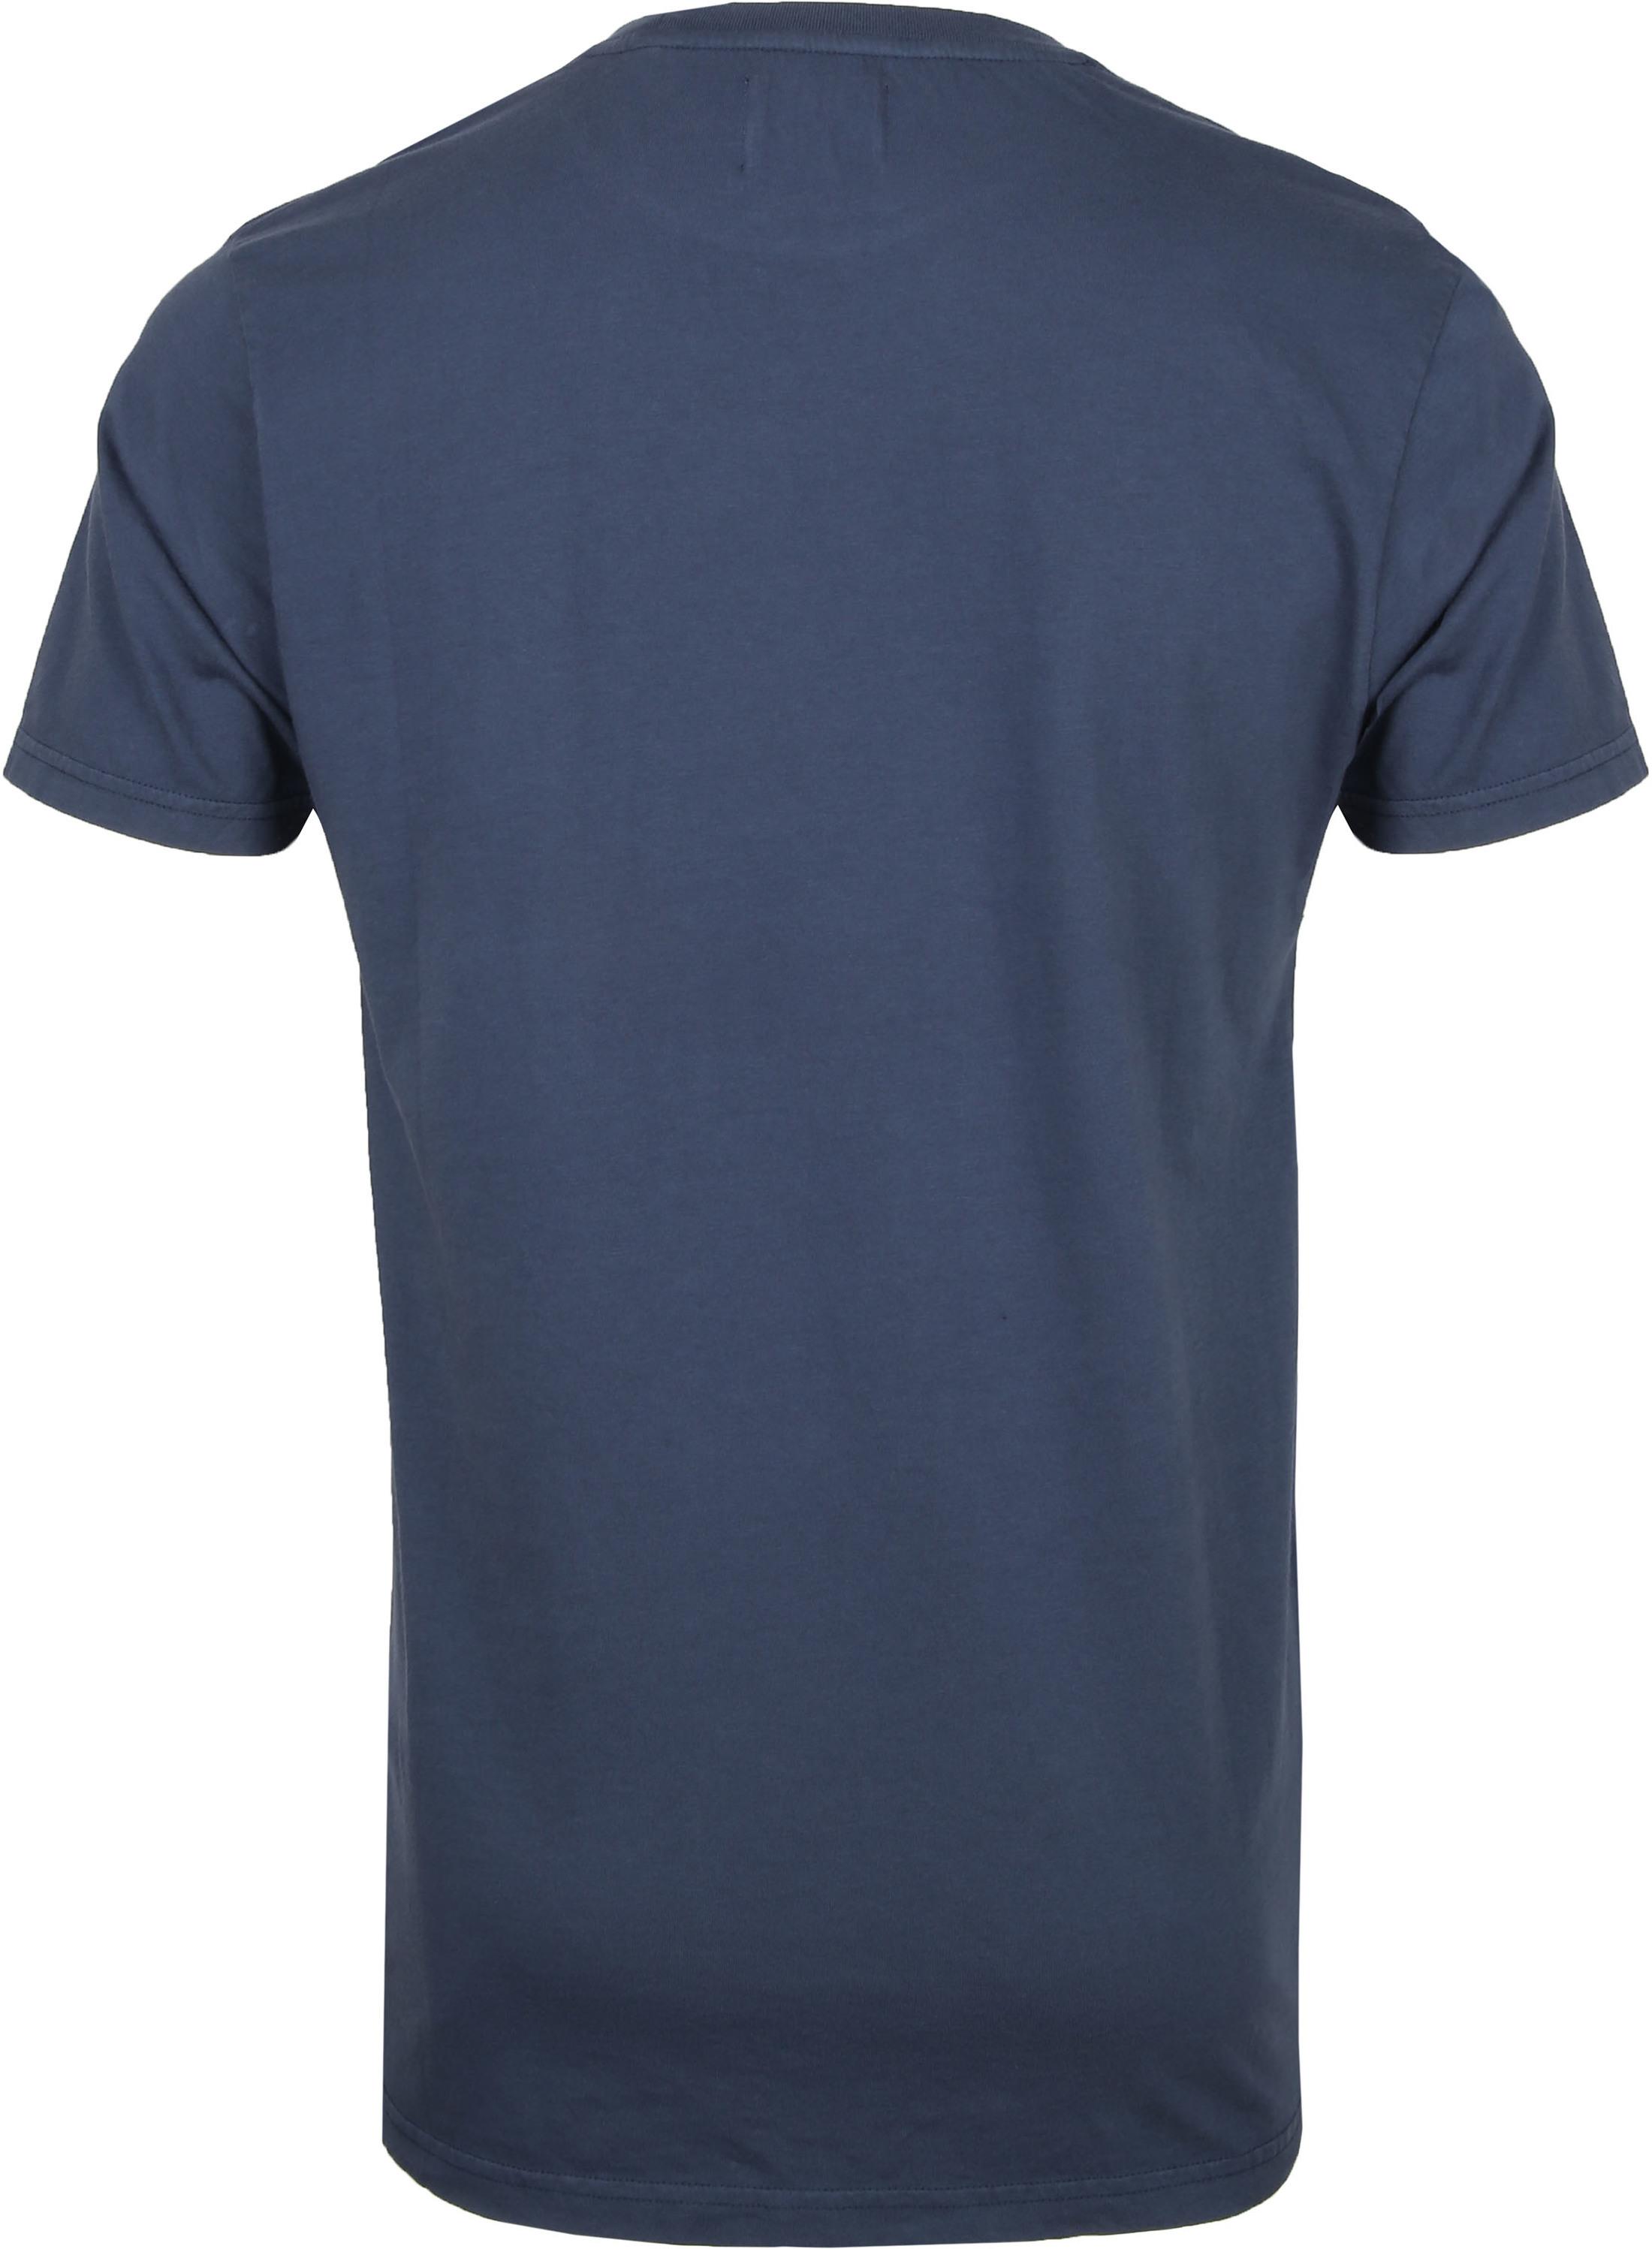 Colorful Standard T-shirt Blauw - Blauw maat XL